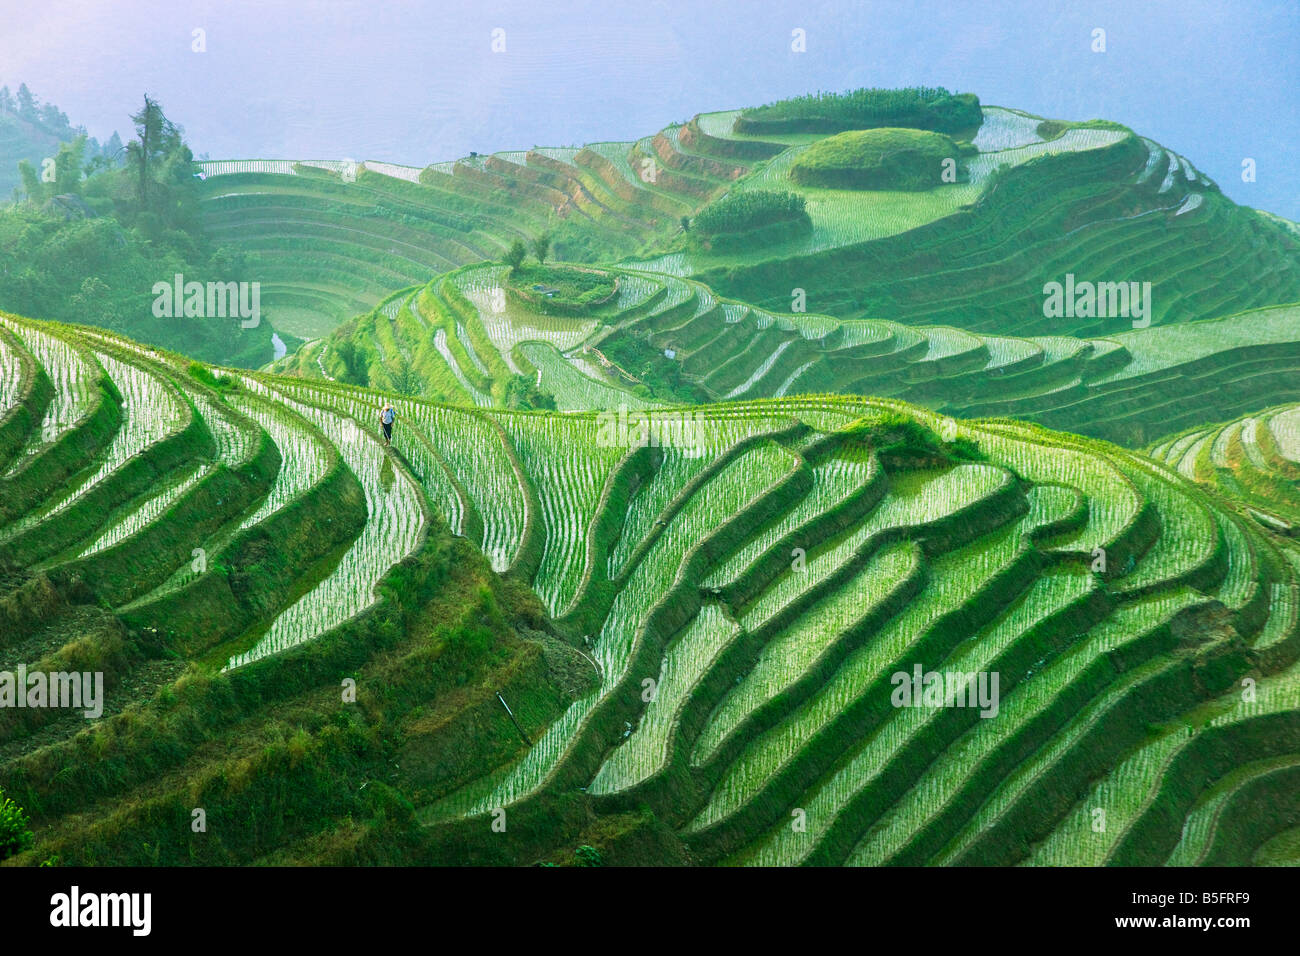 Paisagem de terraços de arroz Longsheng Guangxi China Imagens de Stock